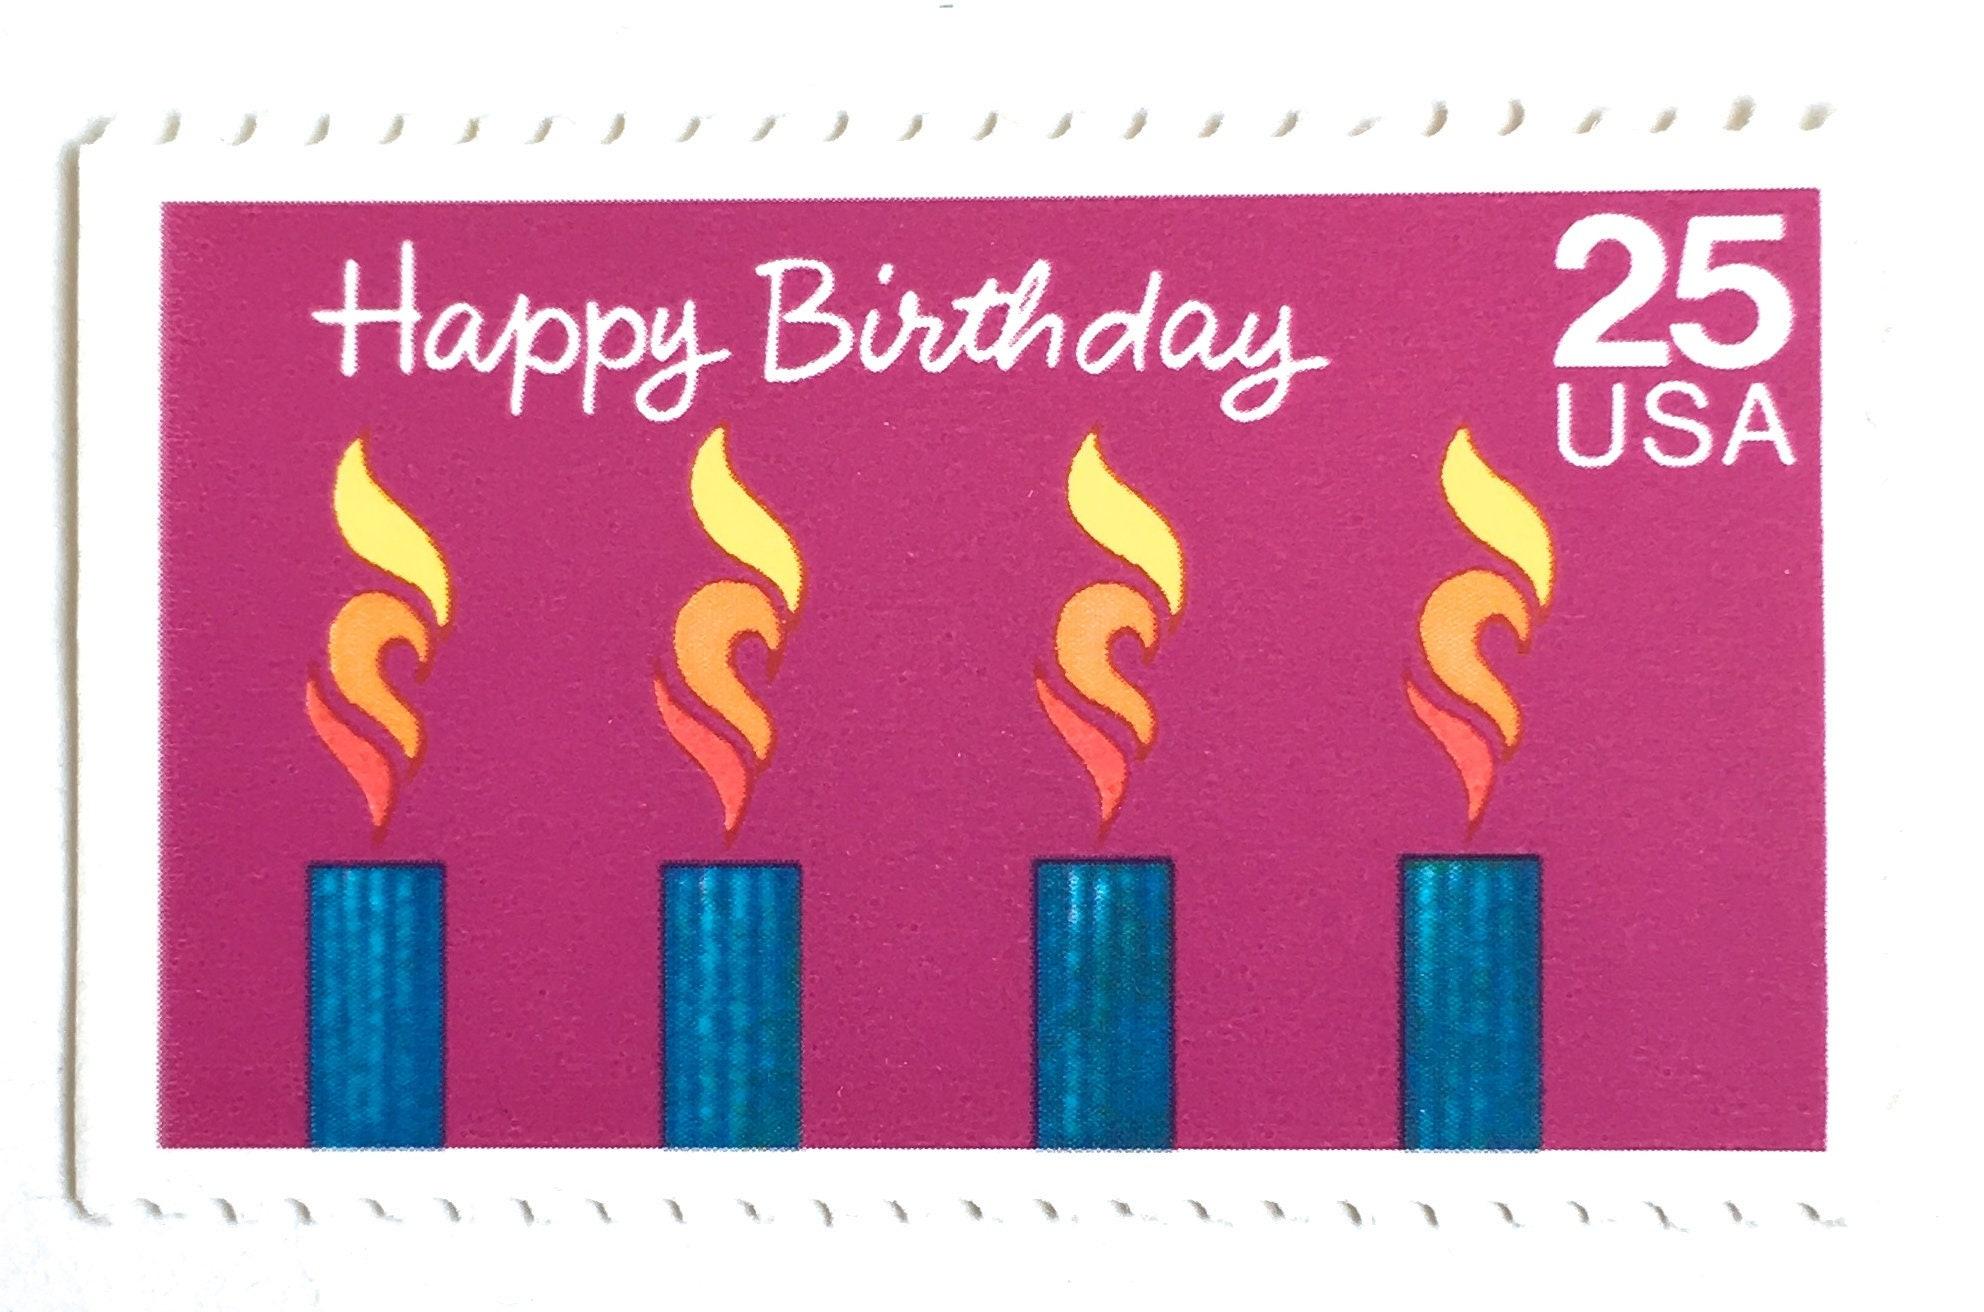 5 Unused Vintage Happy Birthday Postage Stamps // 25 Cent